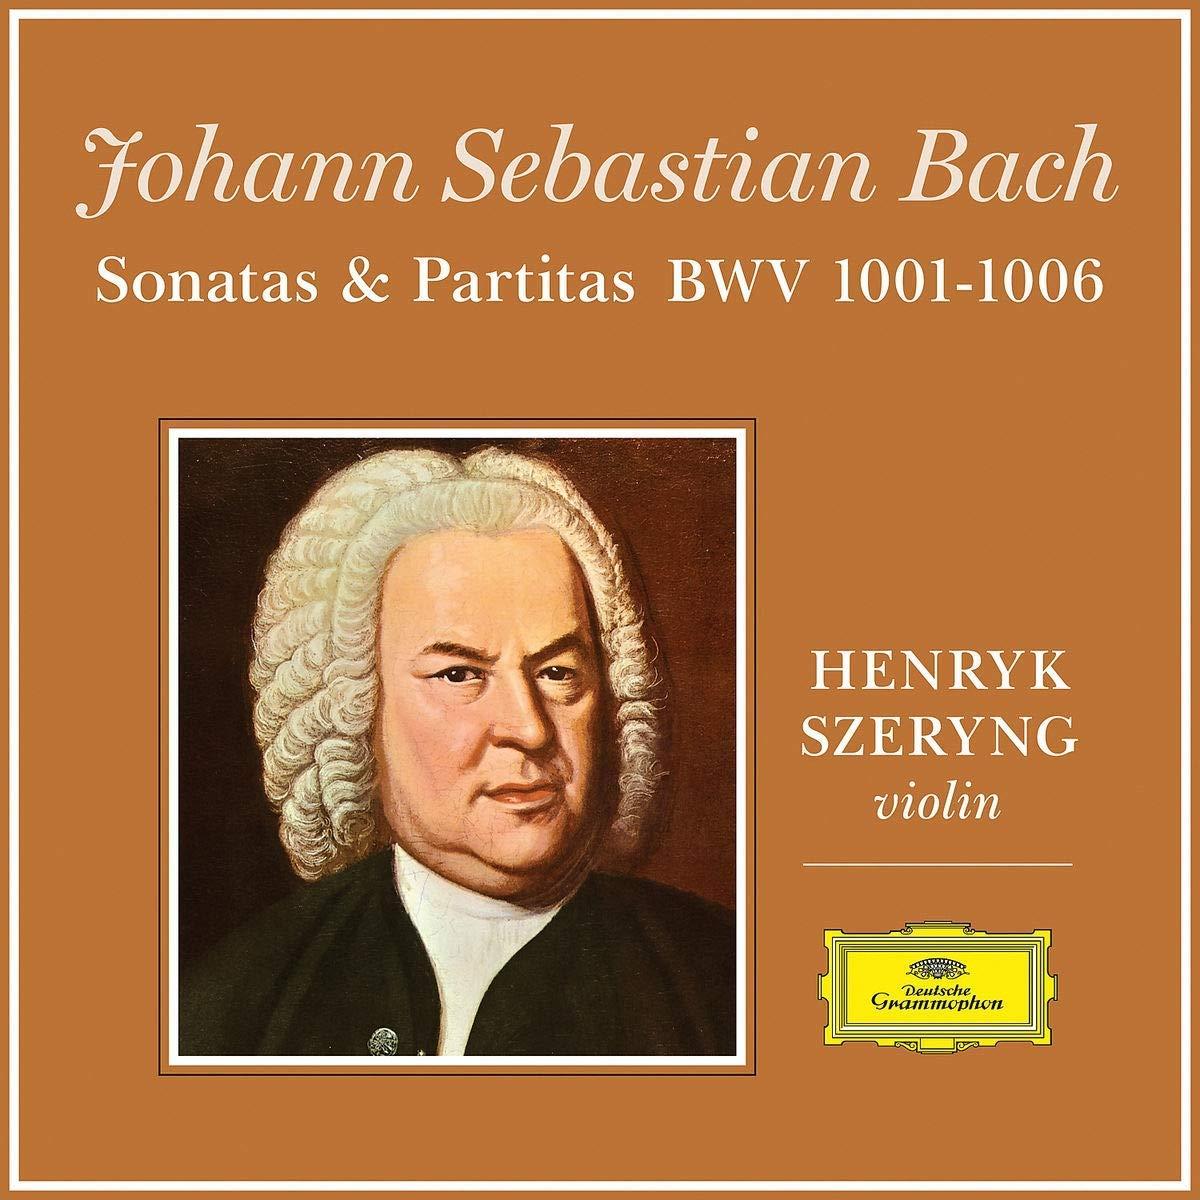 Генри Шеринг Henryk Szeryng. Bach. 6 Sonatas And Partitas For Violin Solo (LP) лара лев lara lev bach sonatas and partitas for solo violin vol 1